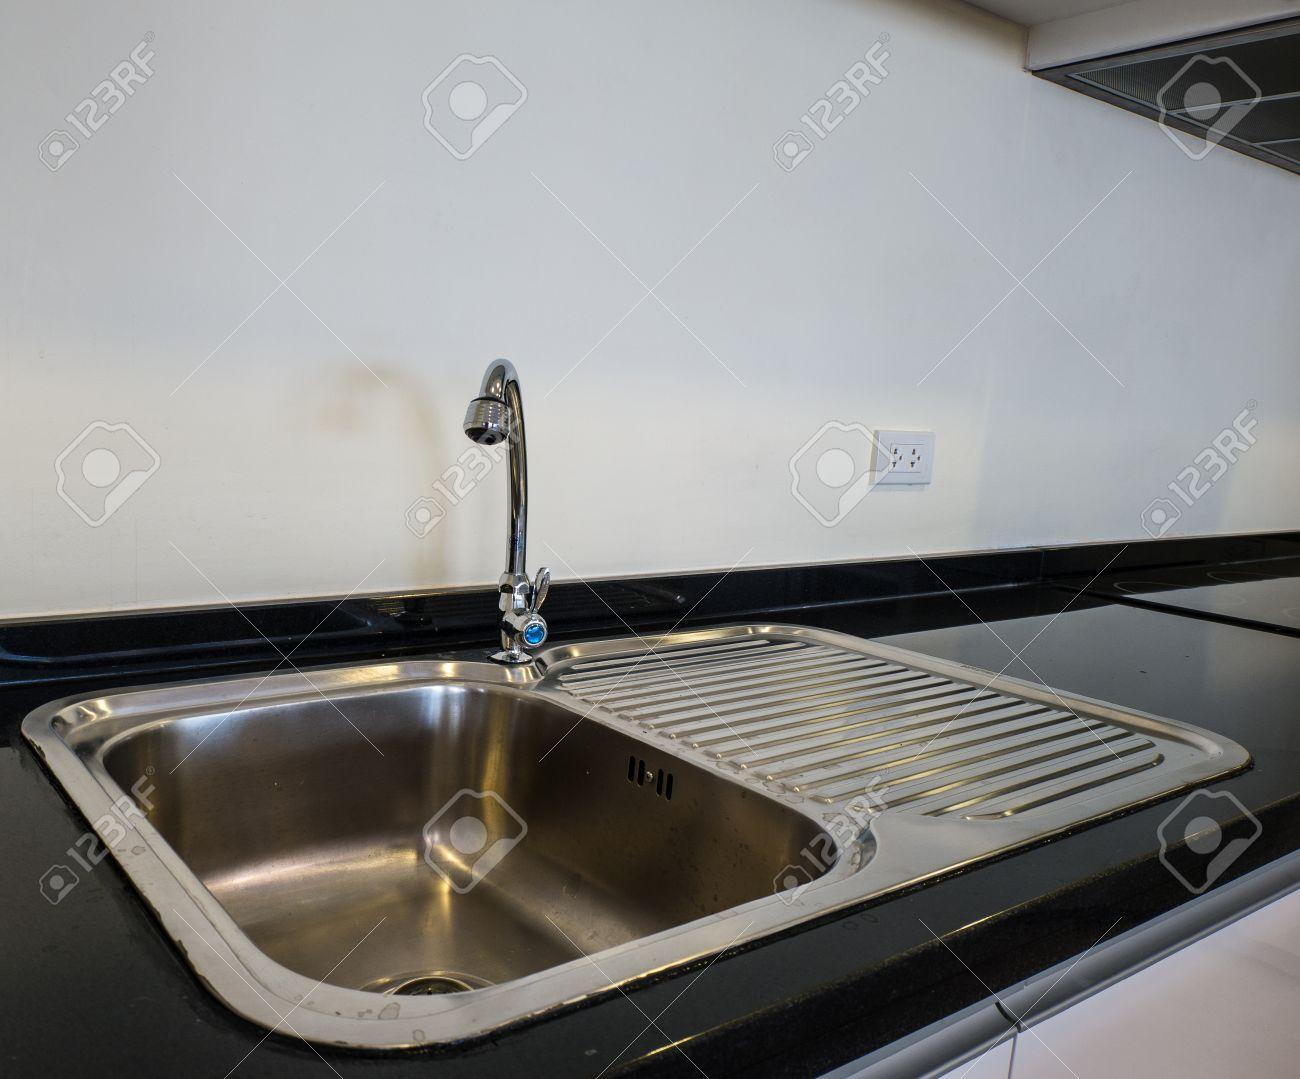 bowl stainless steel kitchen sink on a black granite worktop